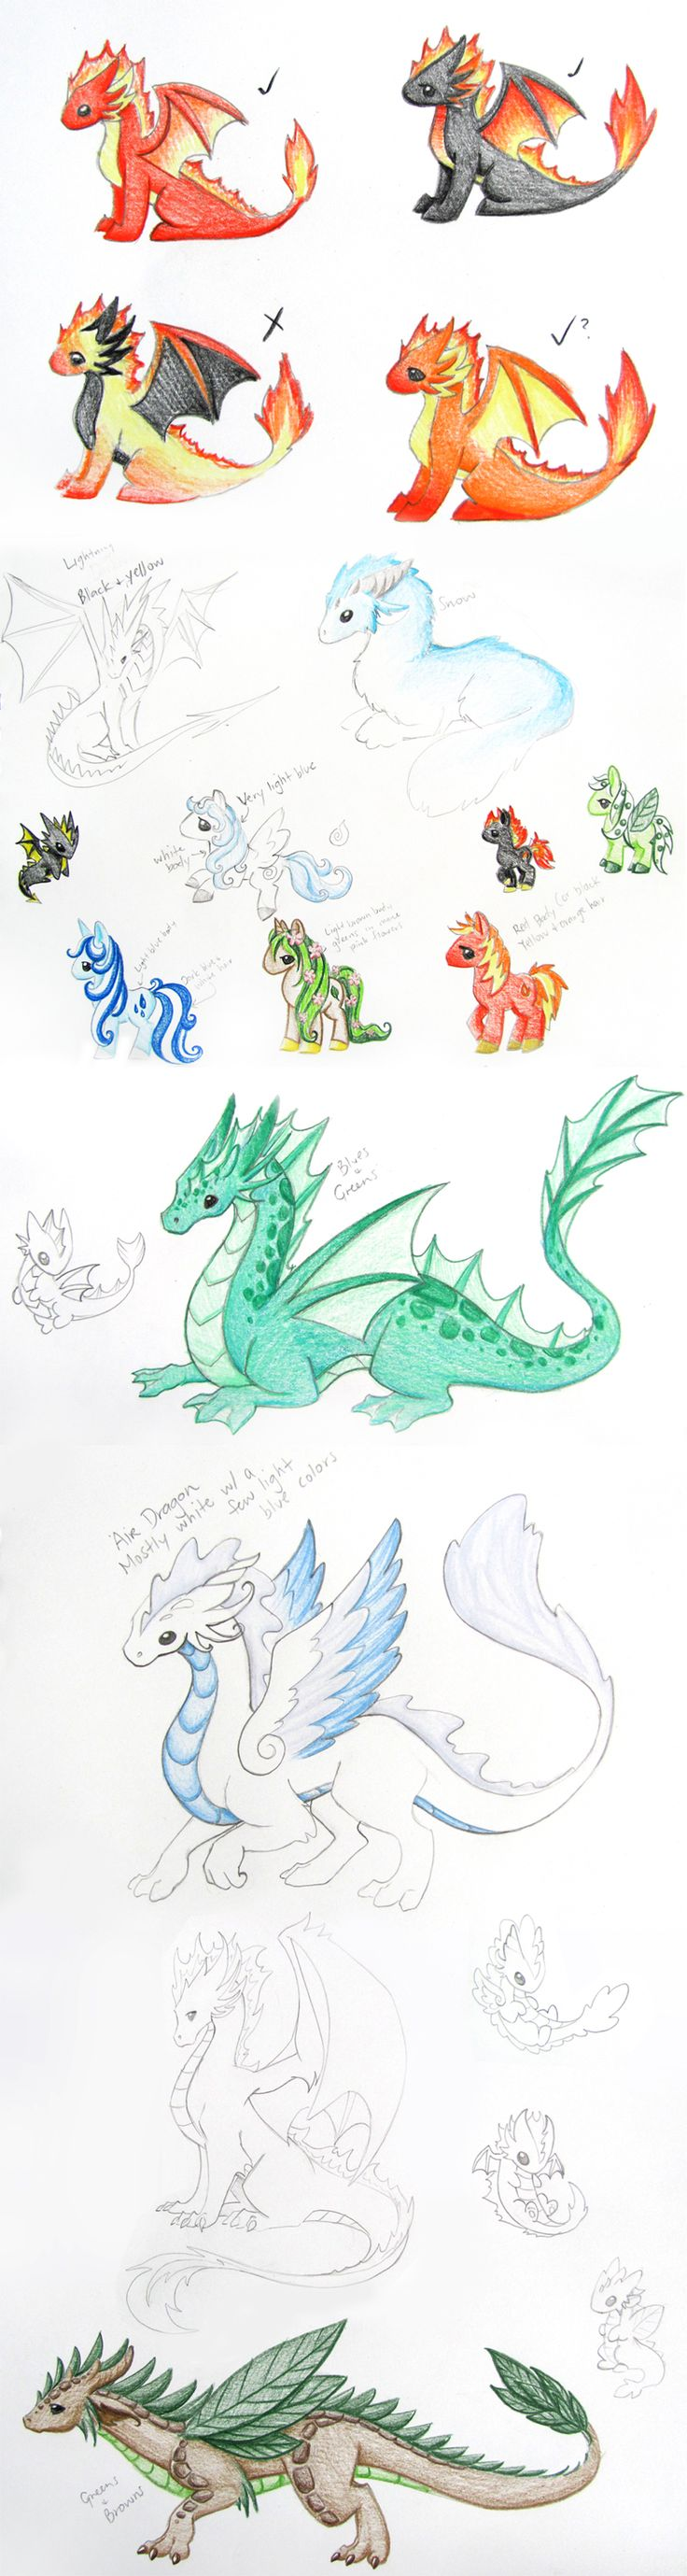 Elemental Concepts by *DragonsAndBeasties on deviantART